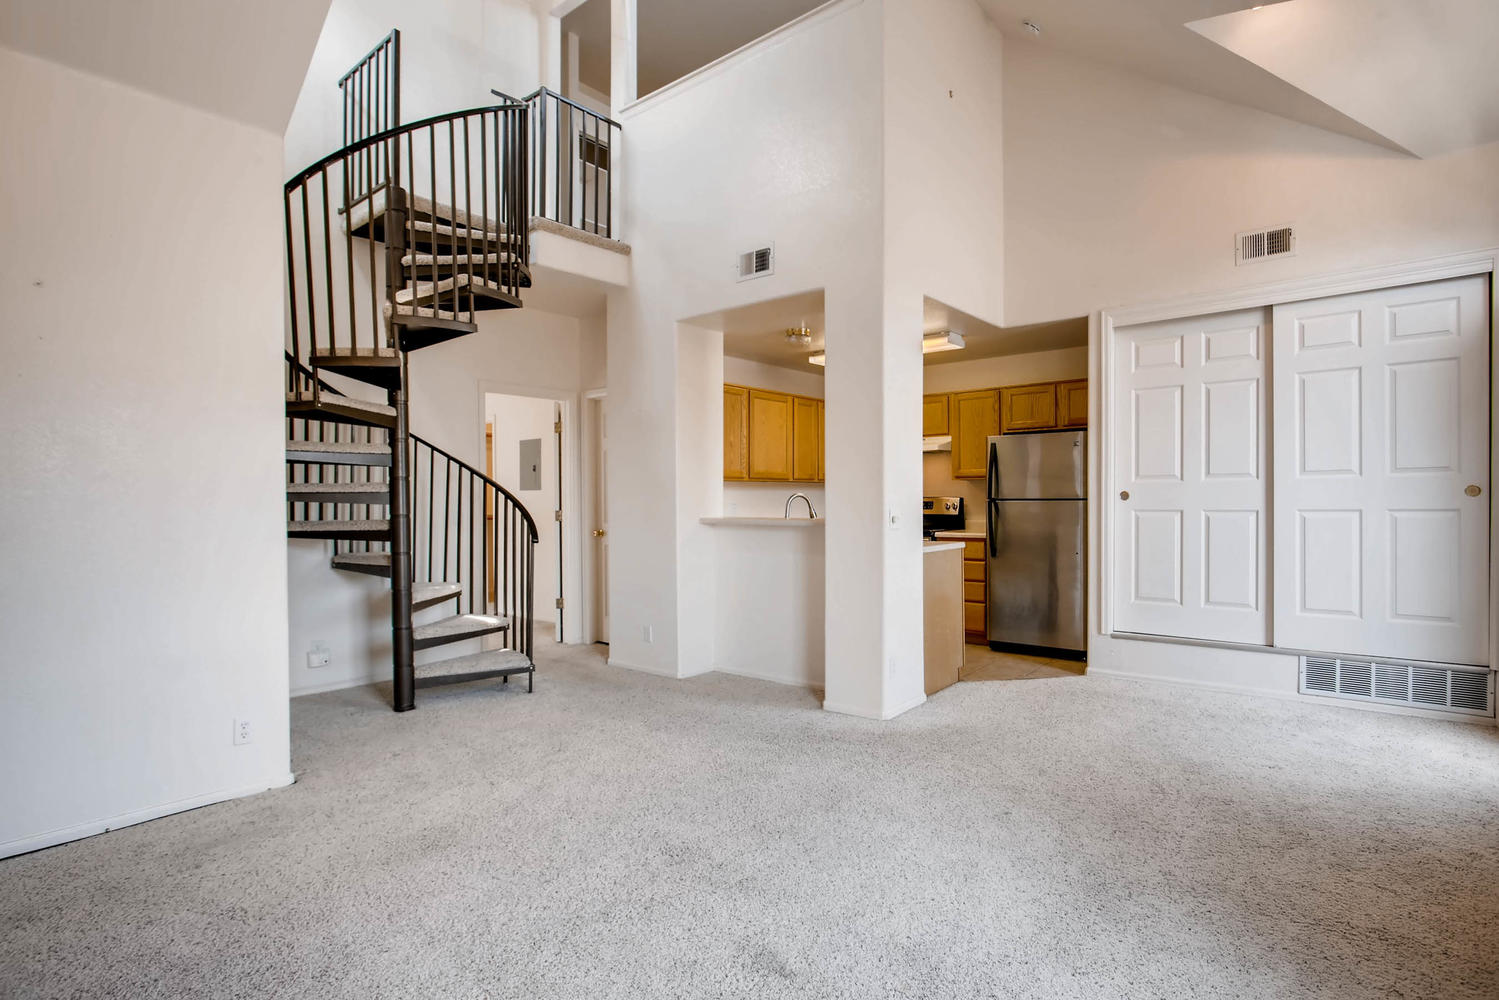 8377 S Upham Way Unit 212-large-007-22-Living Room-1500x1000-72dpi.jpg